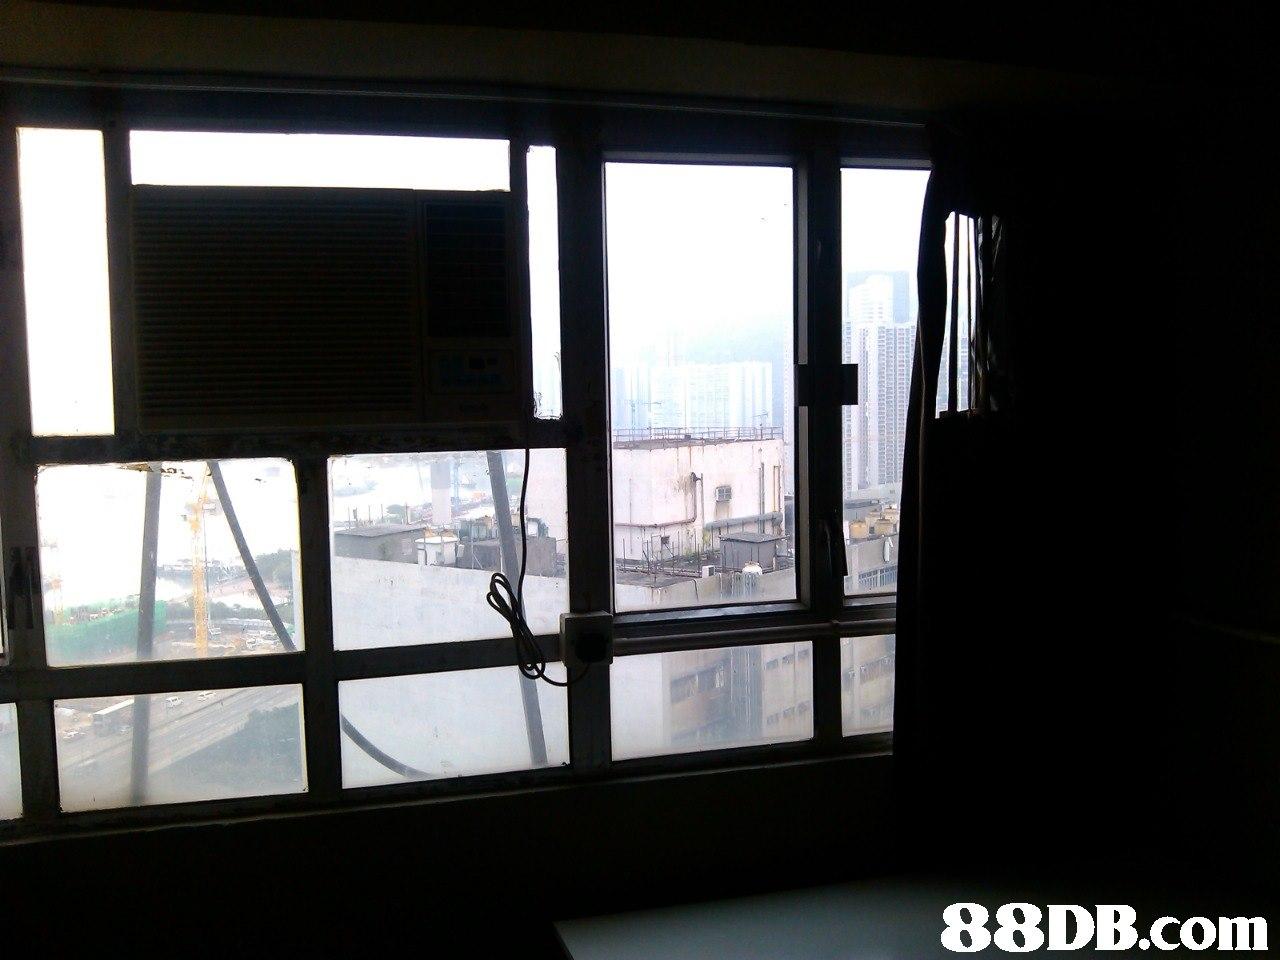 Property,Window,Room,Daylighting,Building